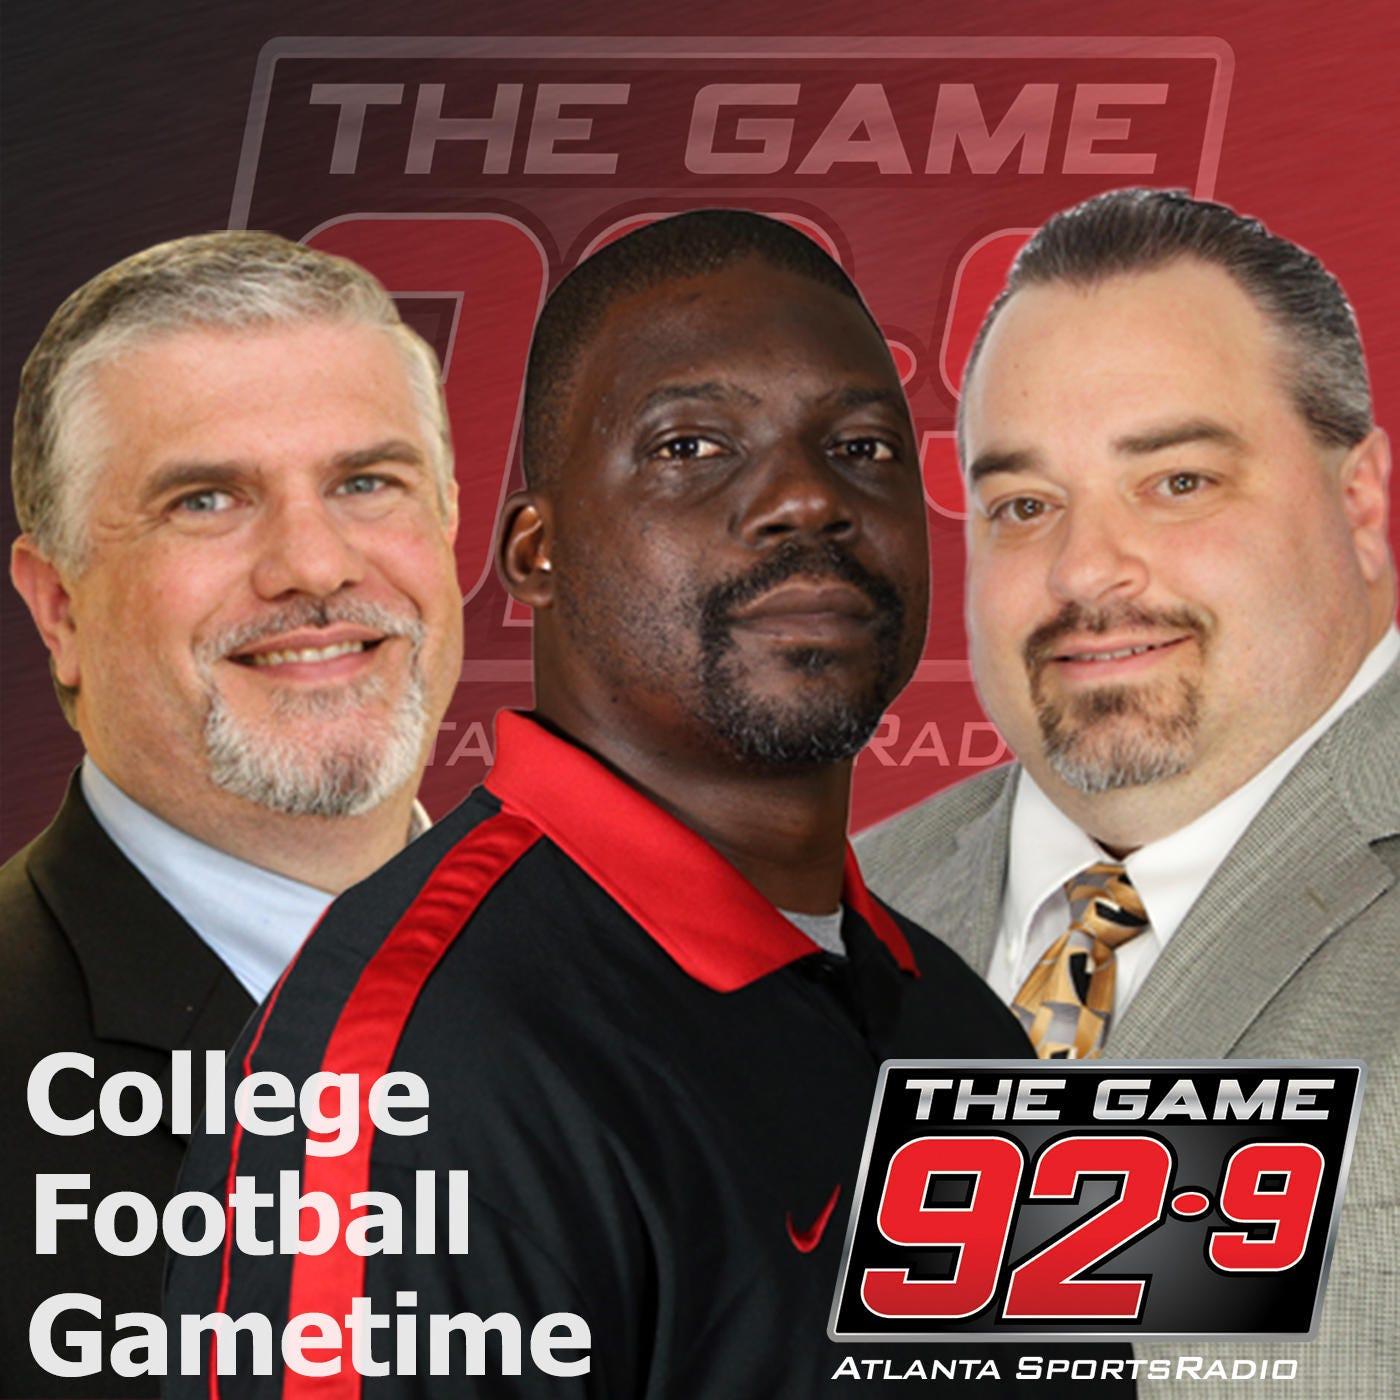 College Football Gametime